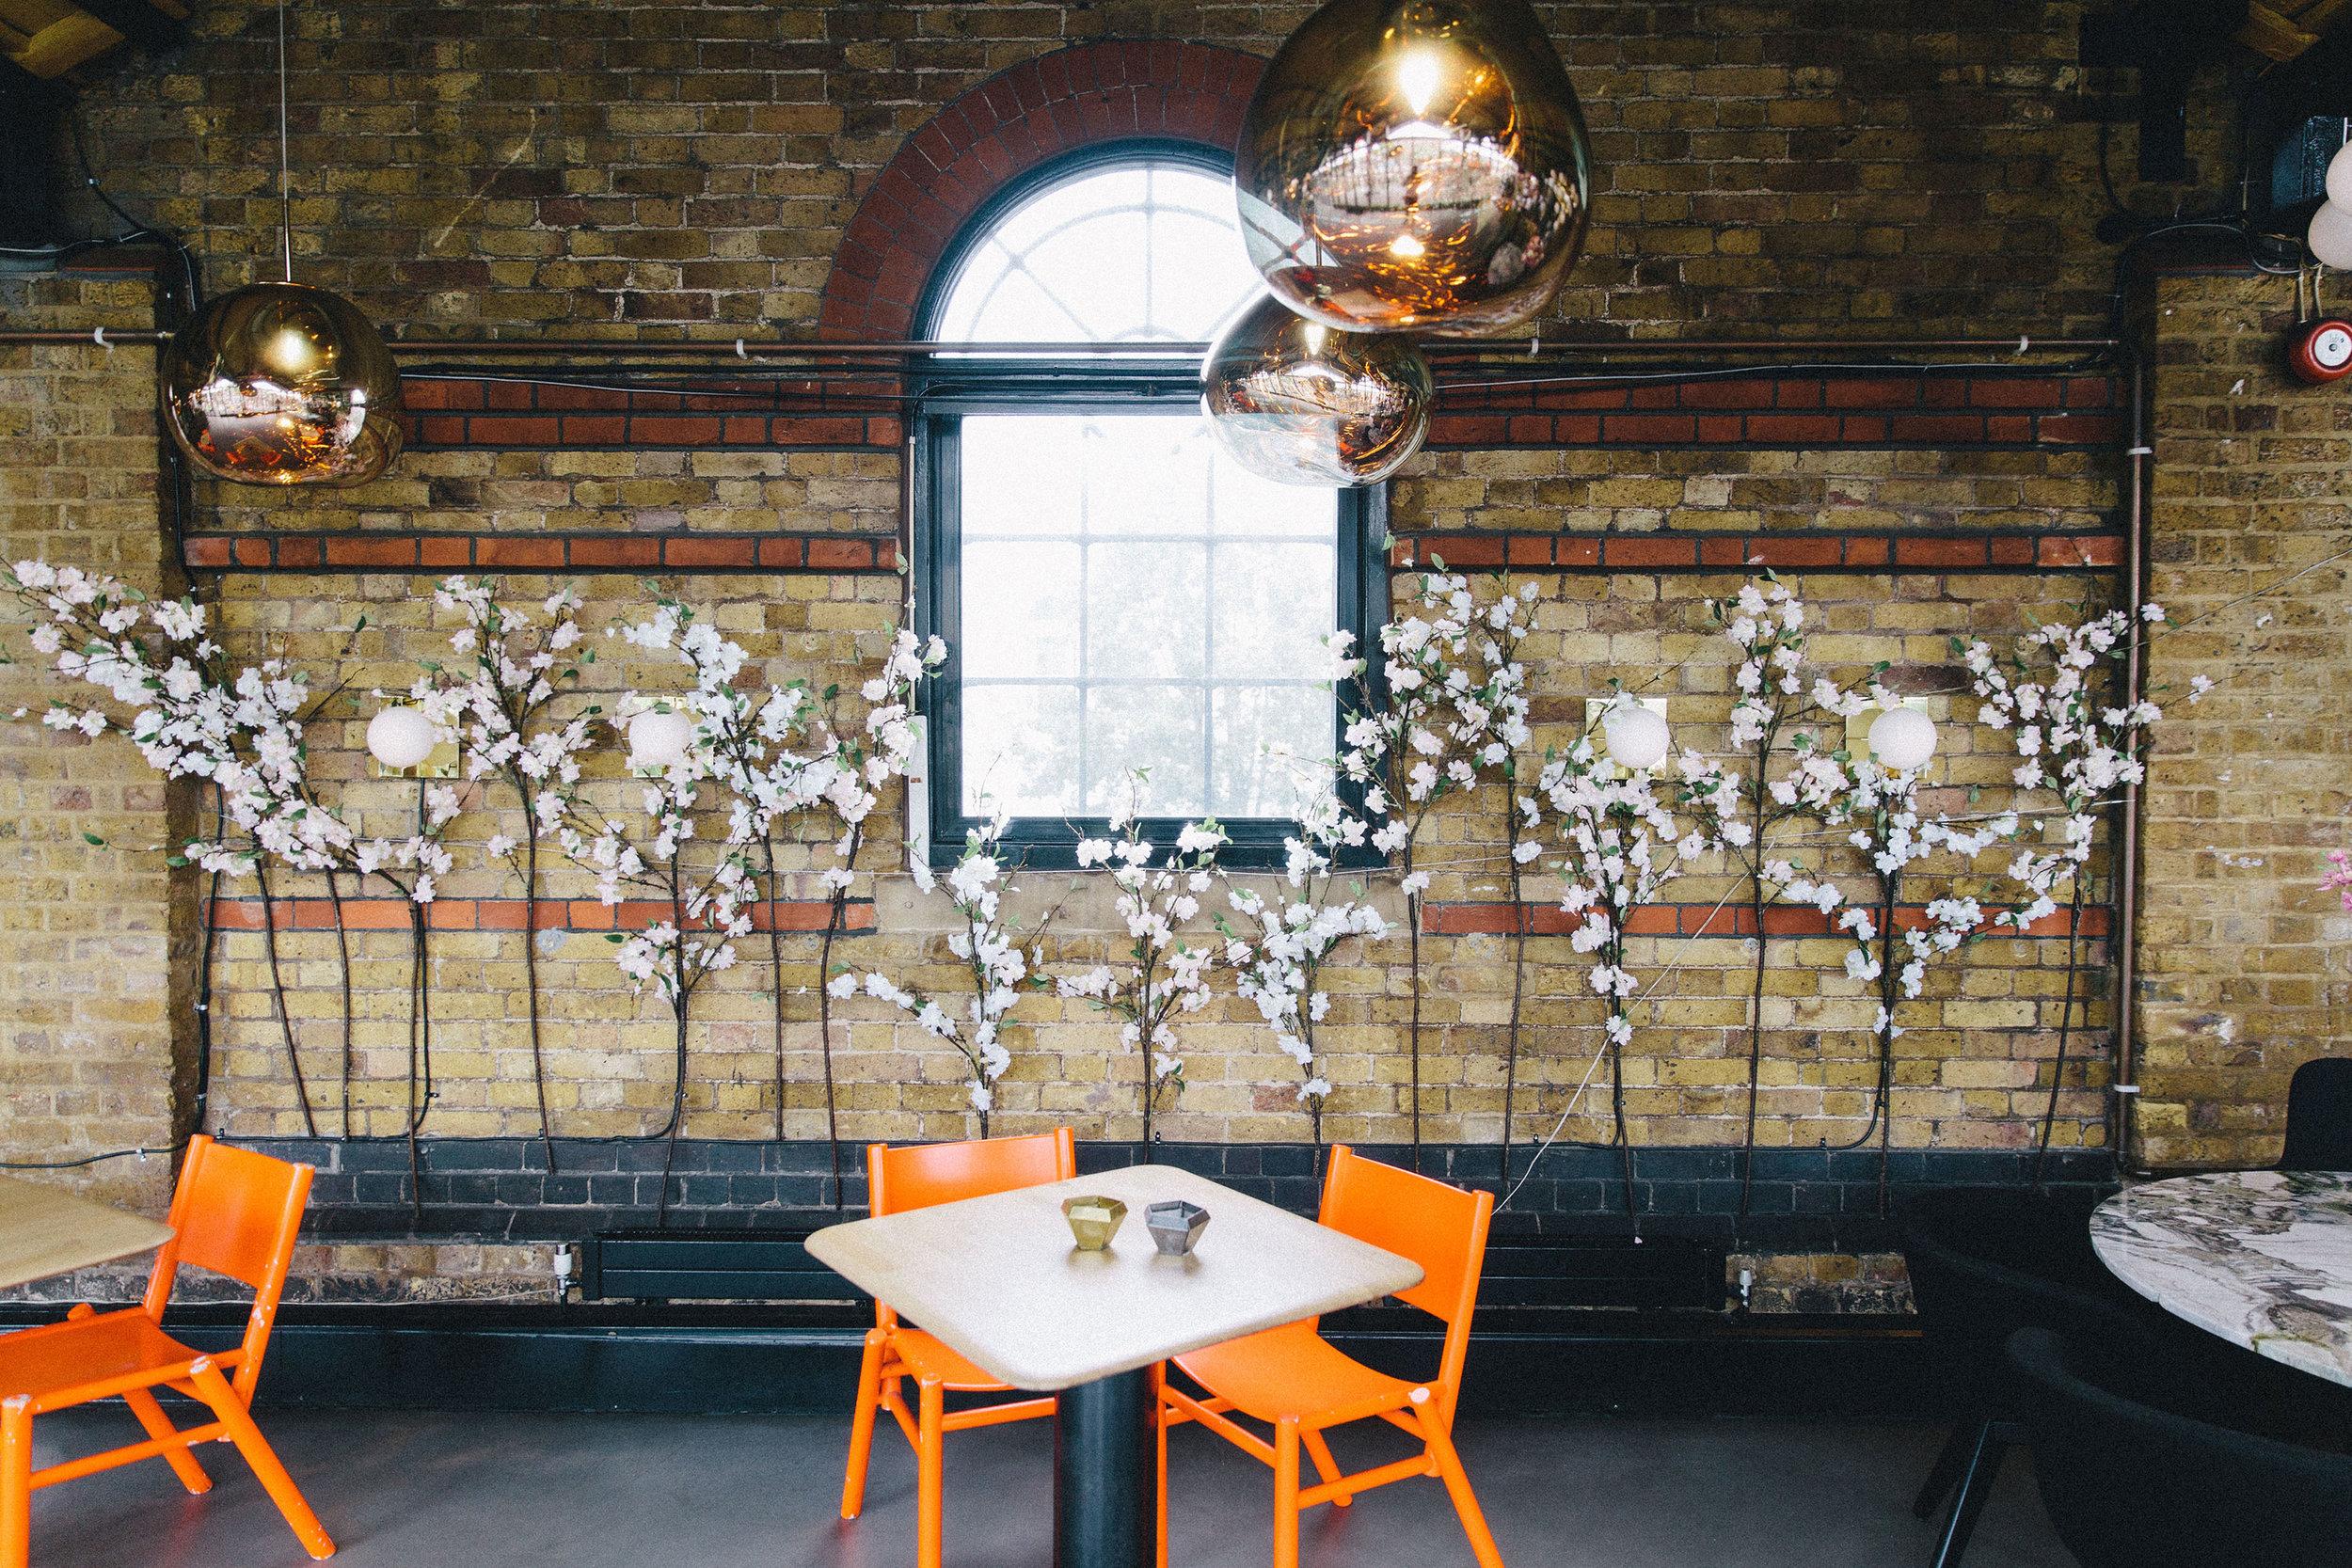 West-London-wedding-party-in-Ladbroke-Grove-Michael-Newington-Gray-4.jpg